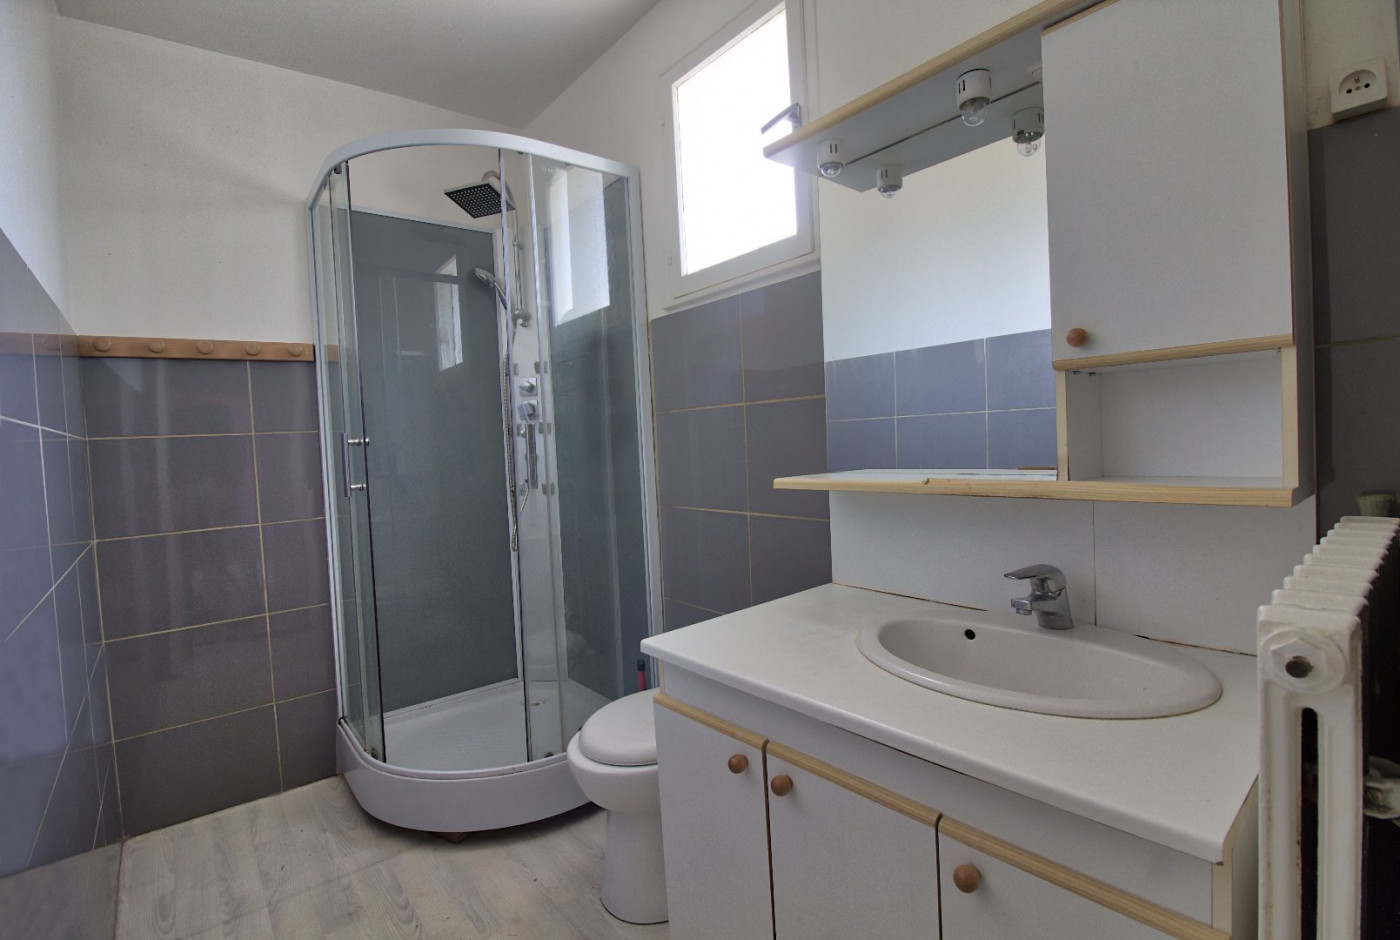 A vendre Chateaubriant 44015620 Agence porte neuve immobilier